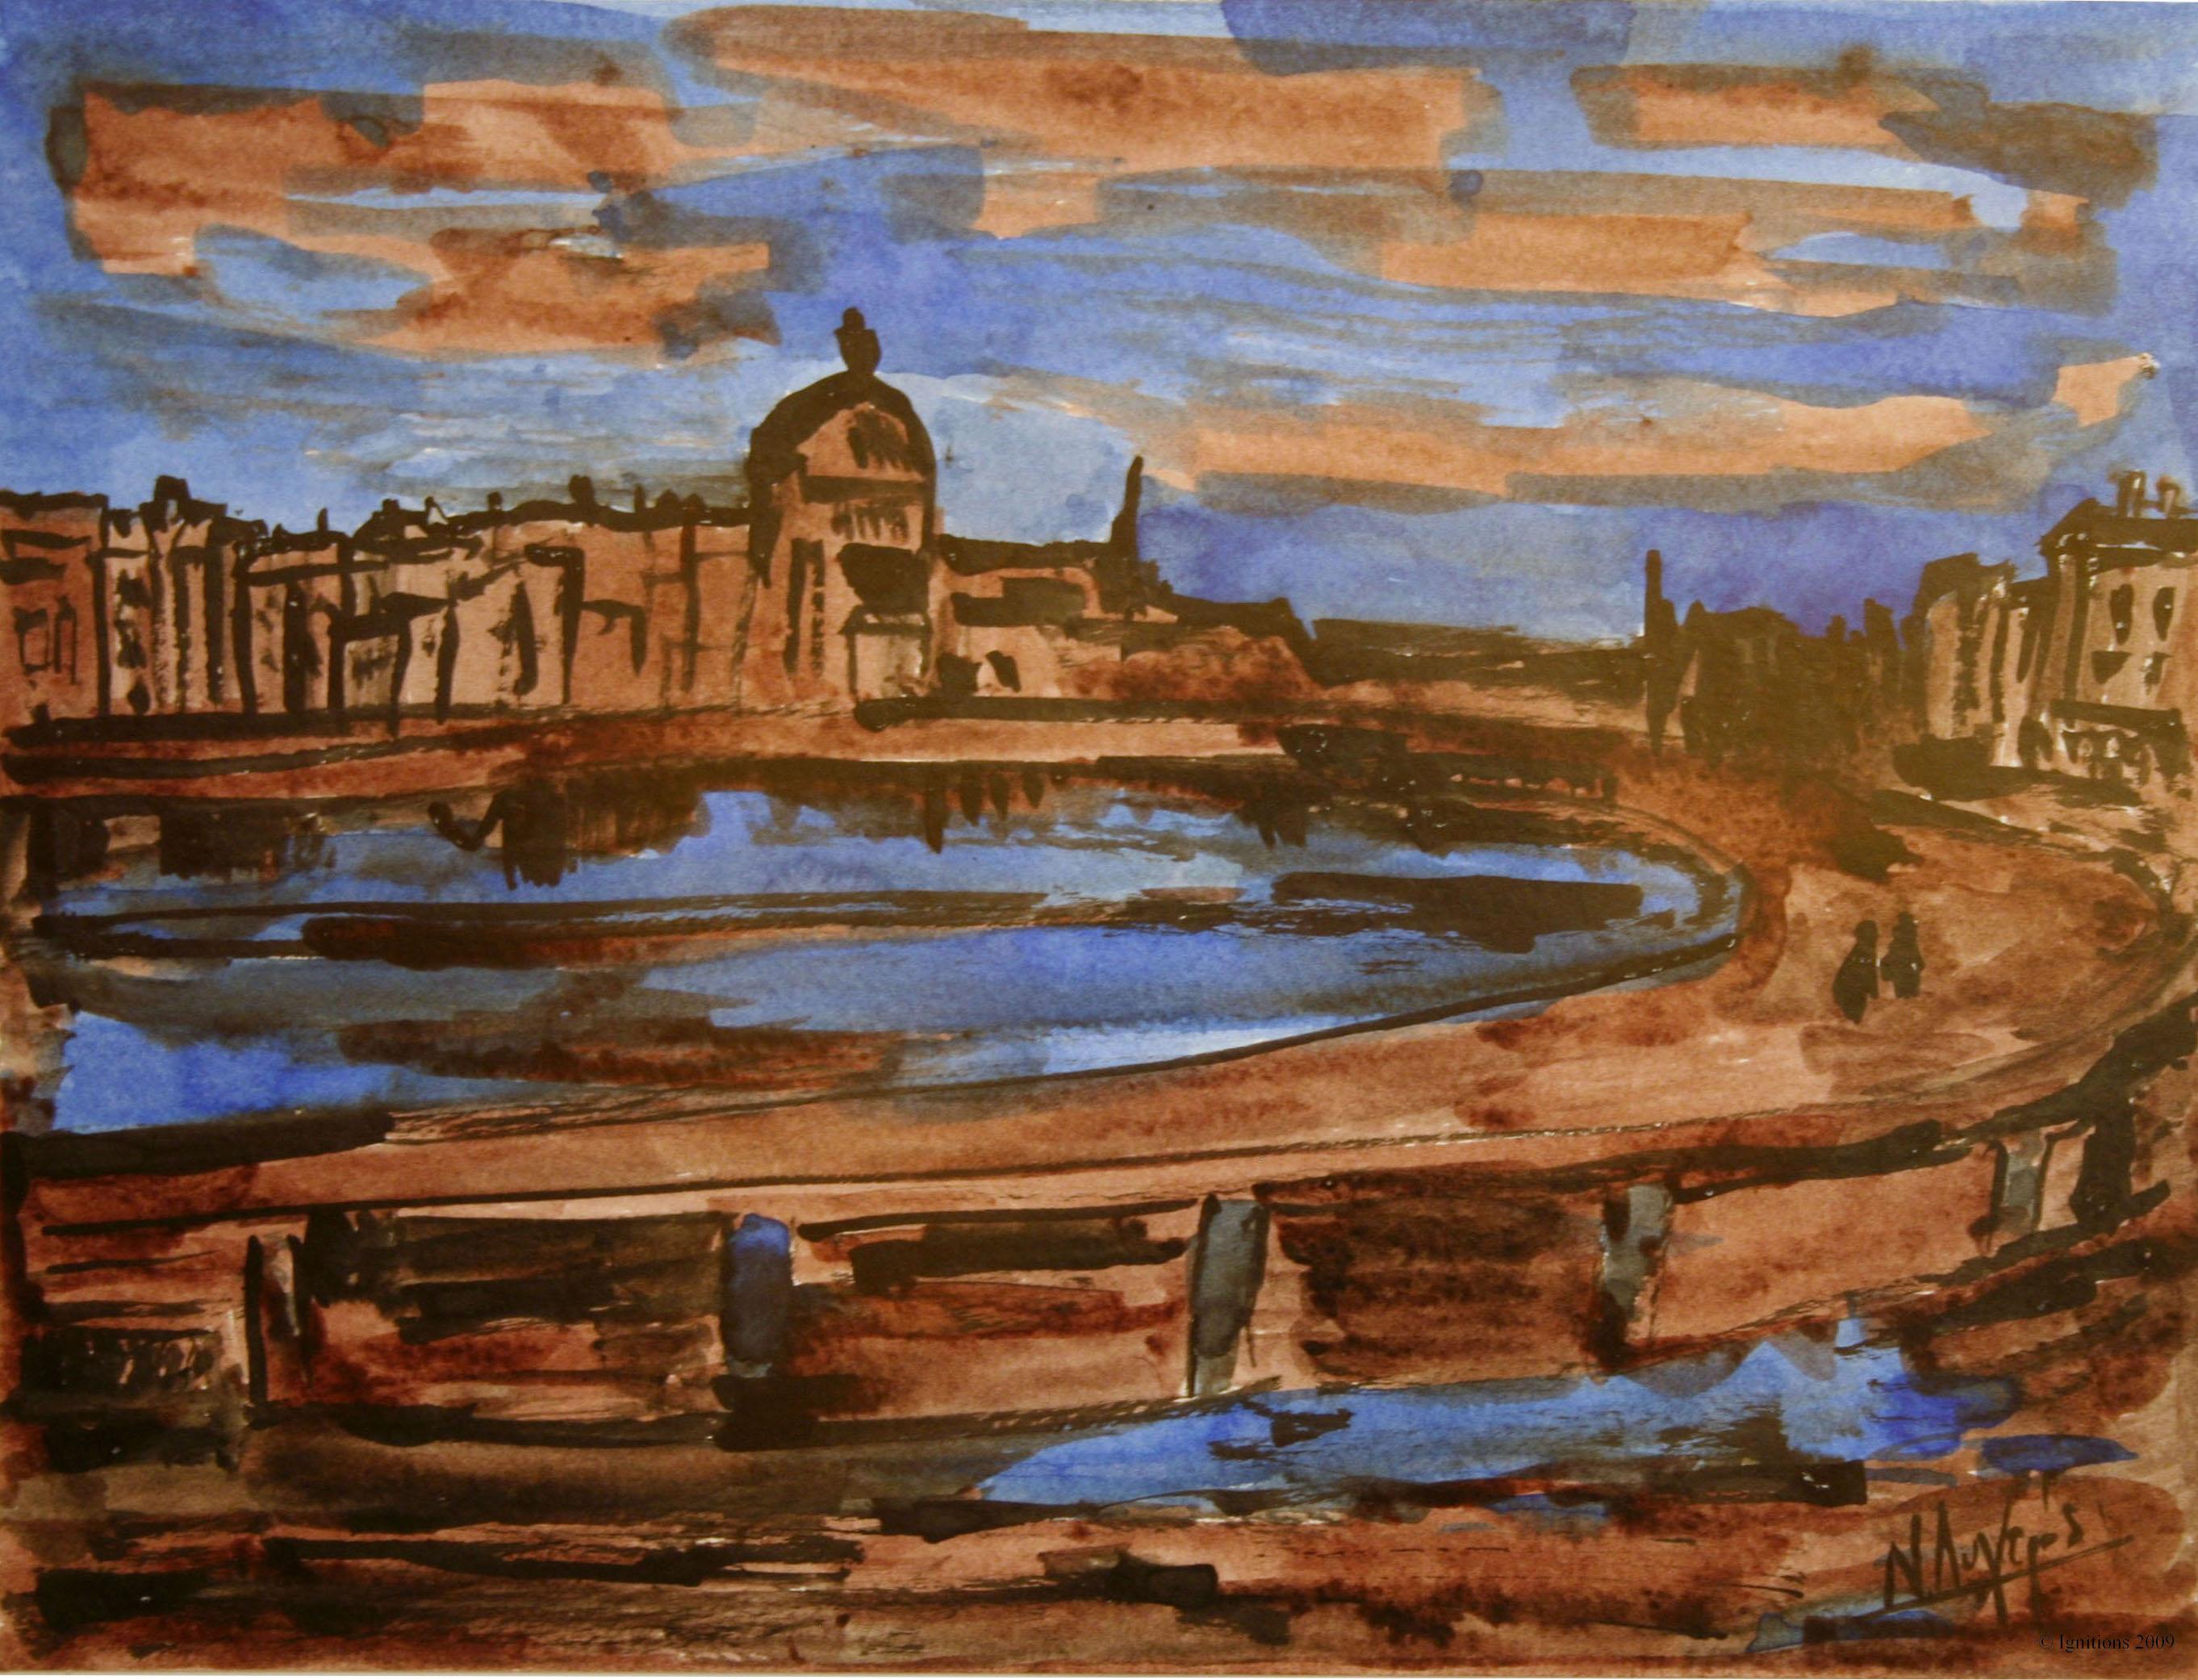 Vue de l'Amsterdam de Vincent.